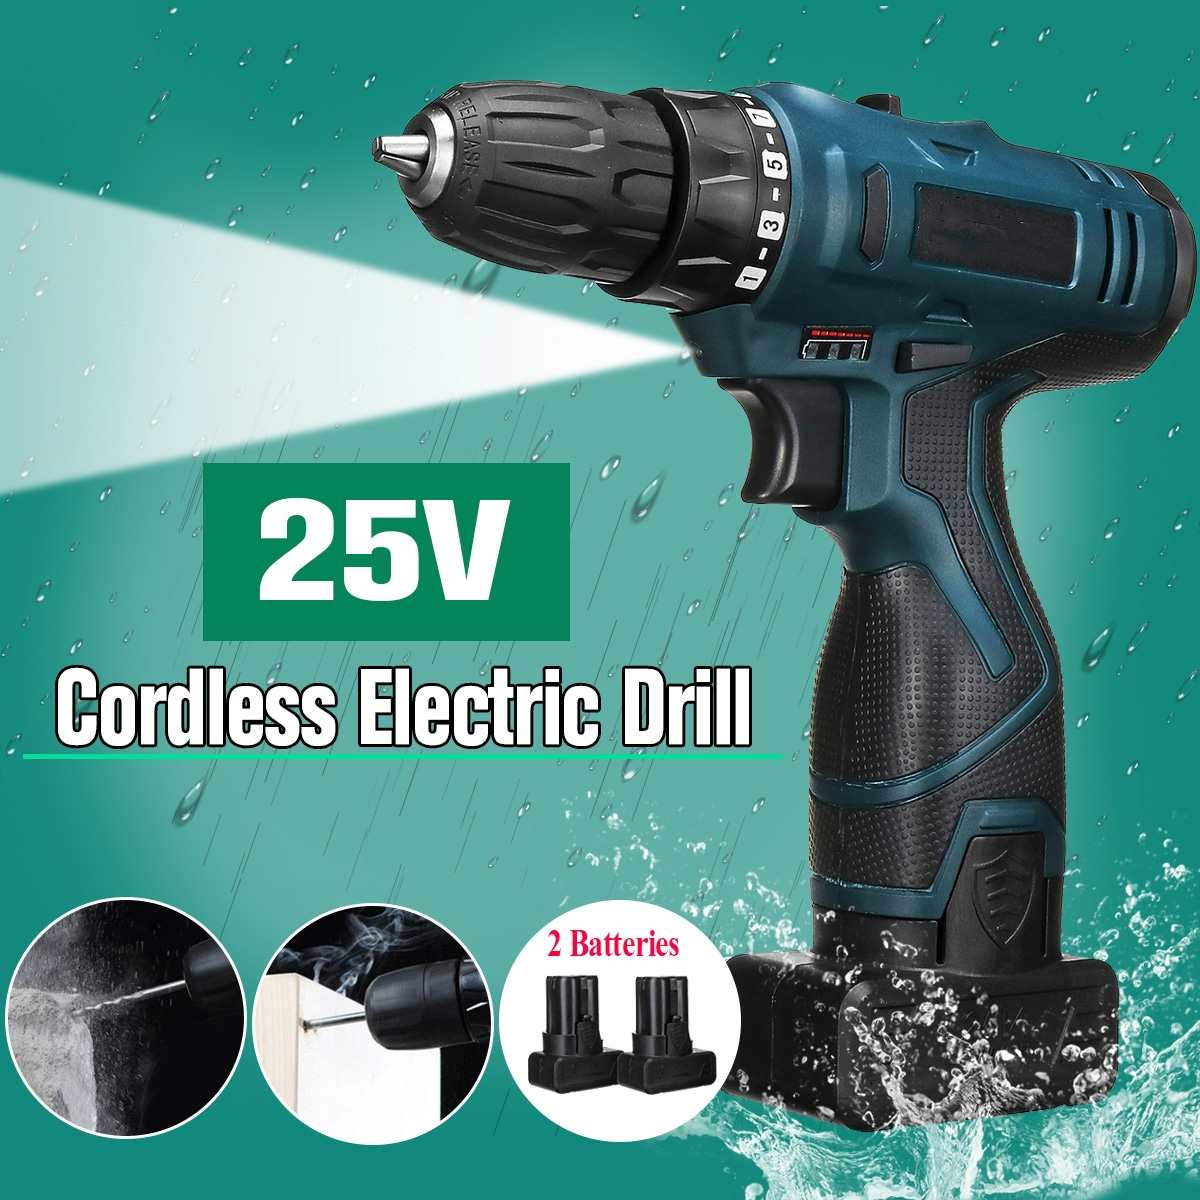 25V LED Light Cordless Power Drill Dual Speed Li-ion Battery Electric Screwdriver Waterproof Motor Torque Screw Power Tools